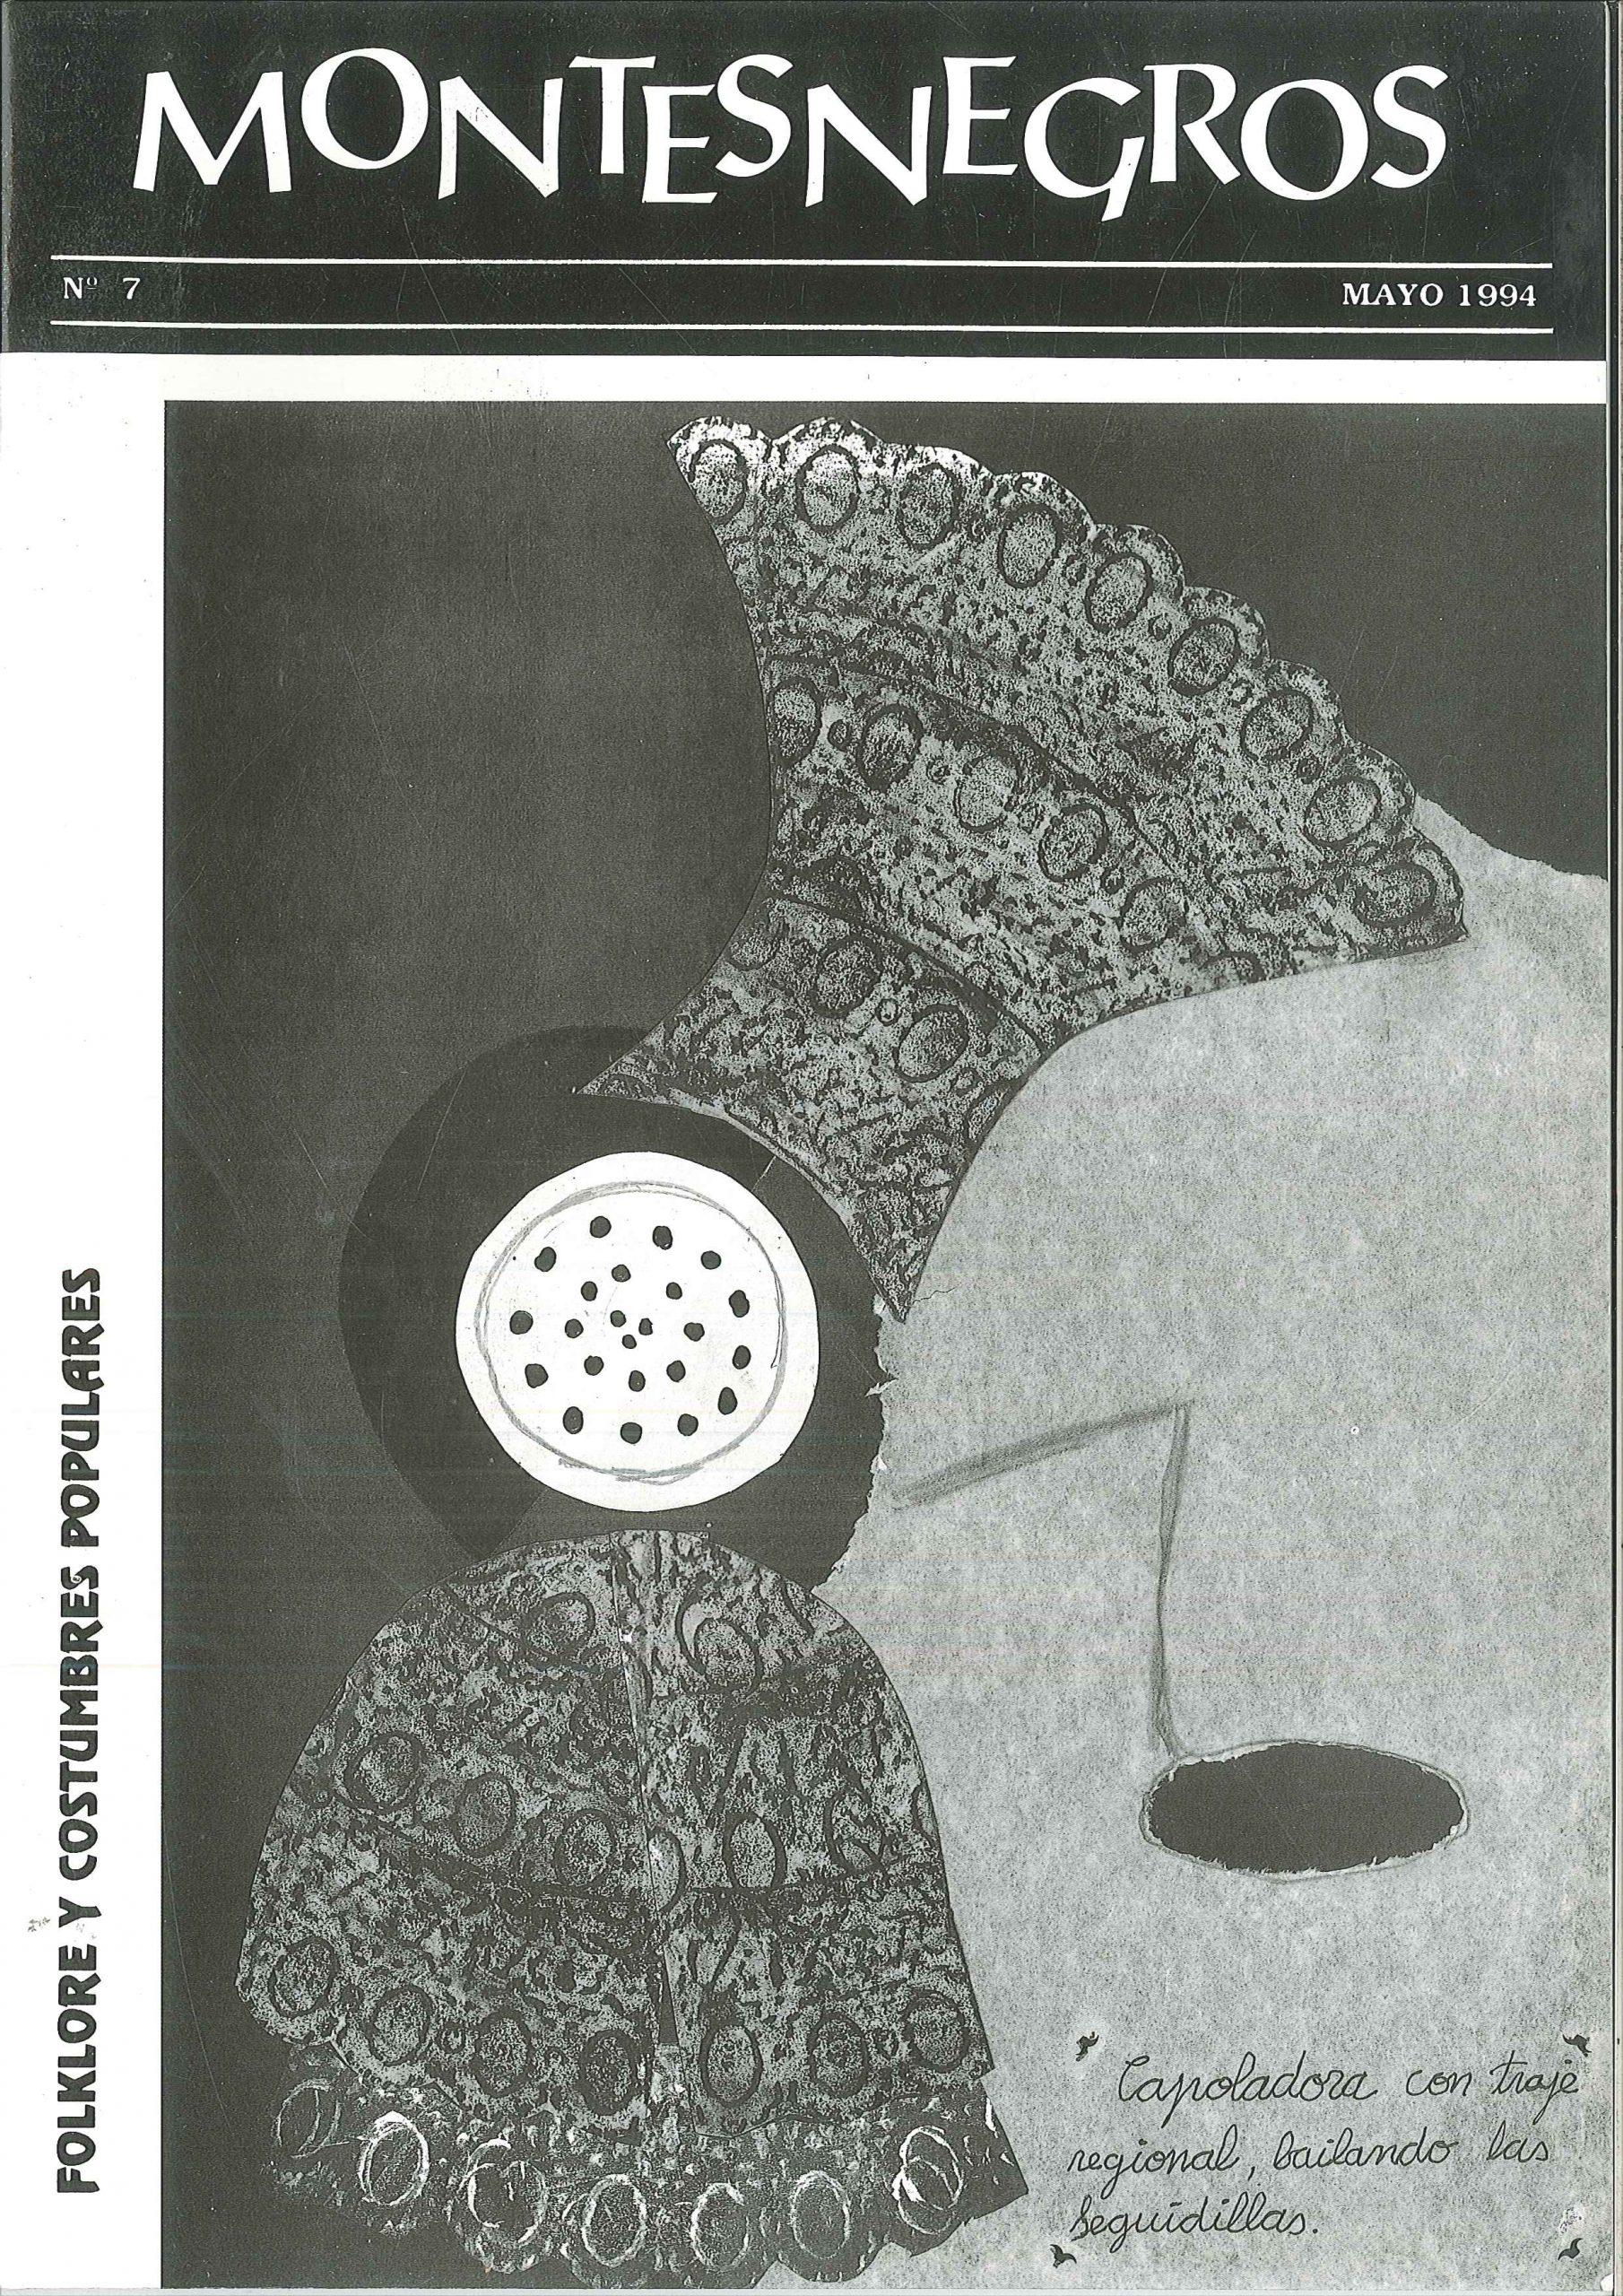 Portada del número 45 de la revista Montesnegros